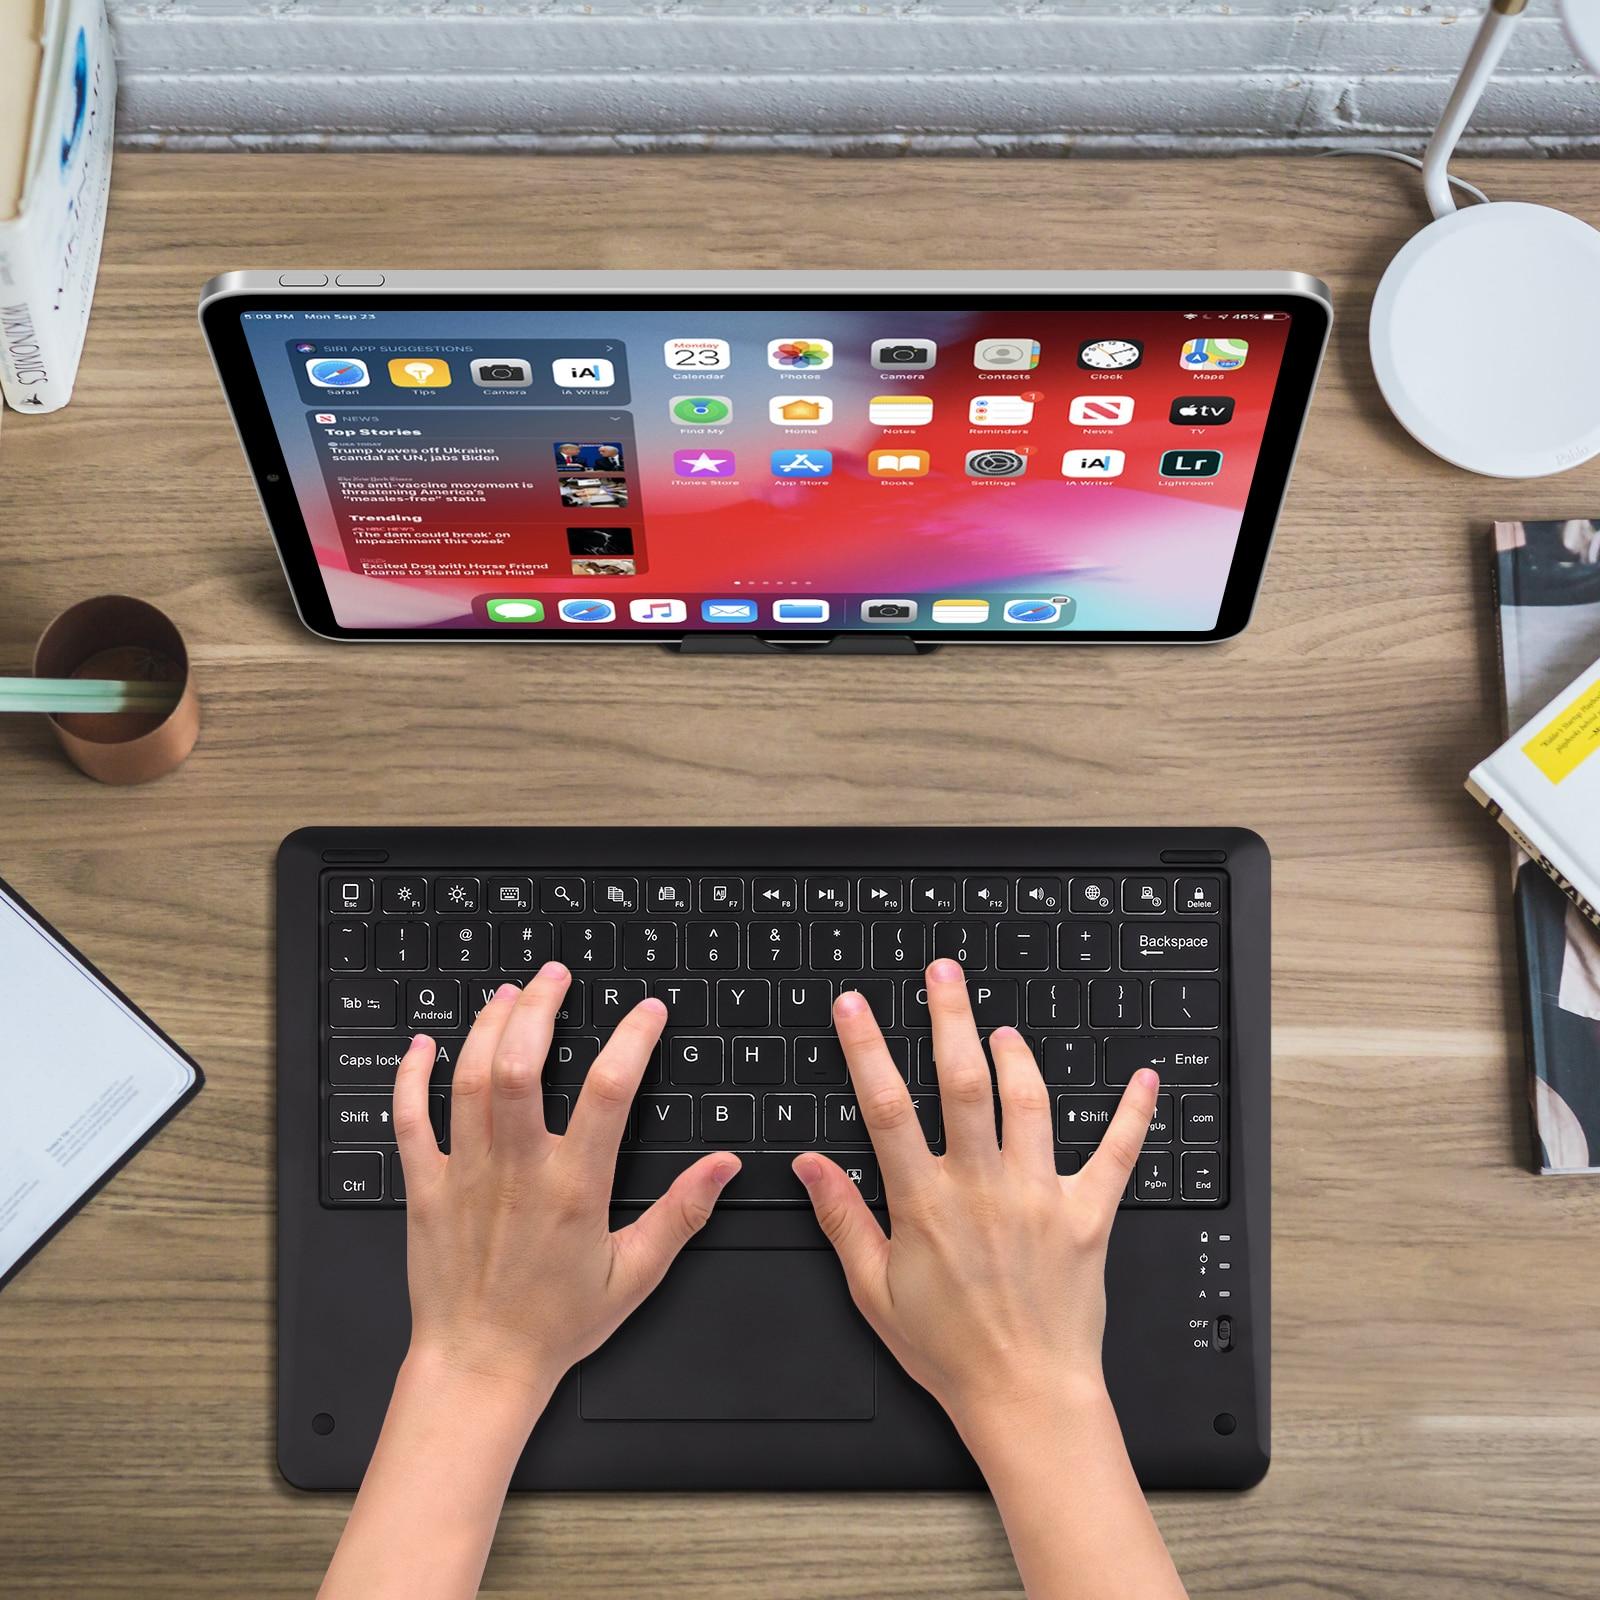 "12"" Wireless Bluetooth Keyboard For iPad Pro 12 9 2021 Teclado Bluetooth For iPad Keyboard Pro 11 Android ios Windows PC Laptop"